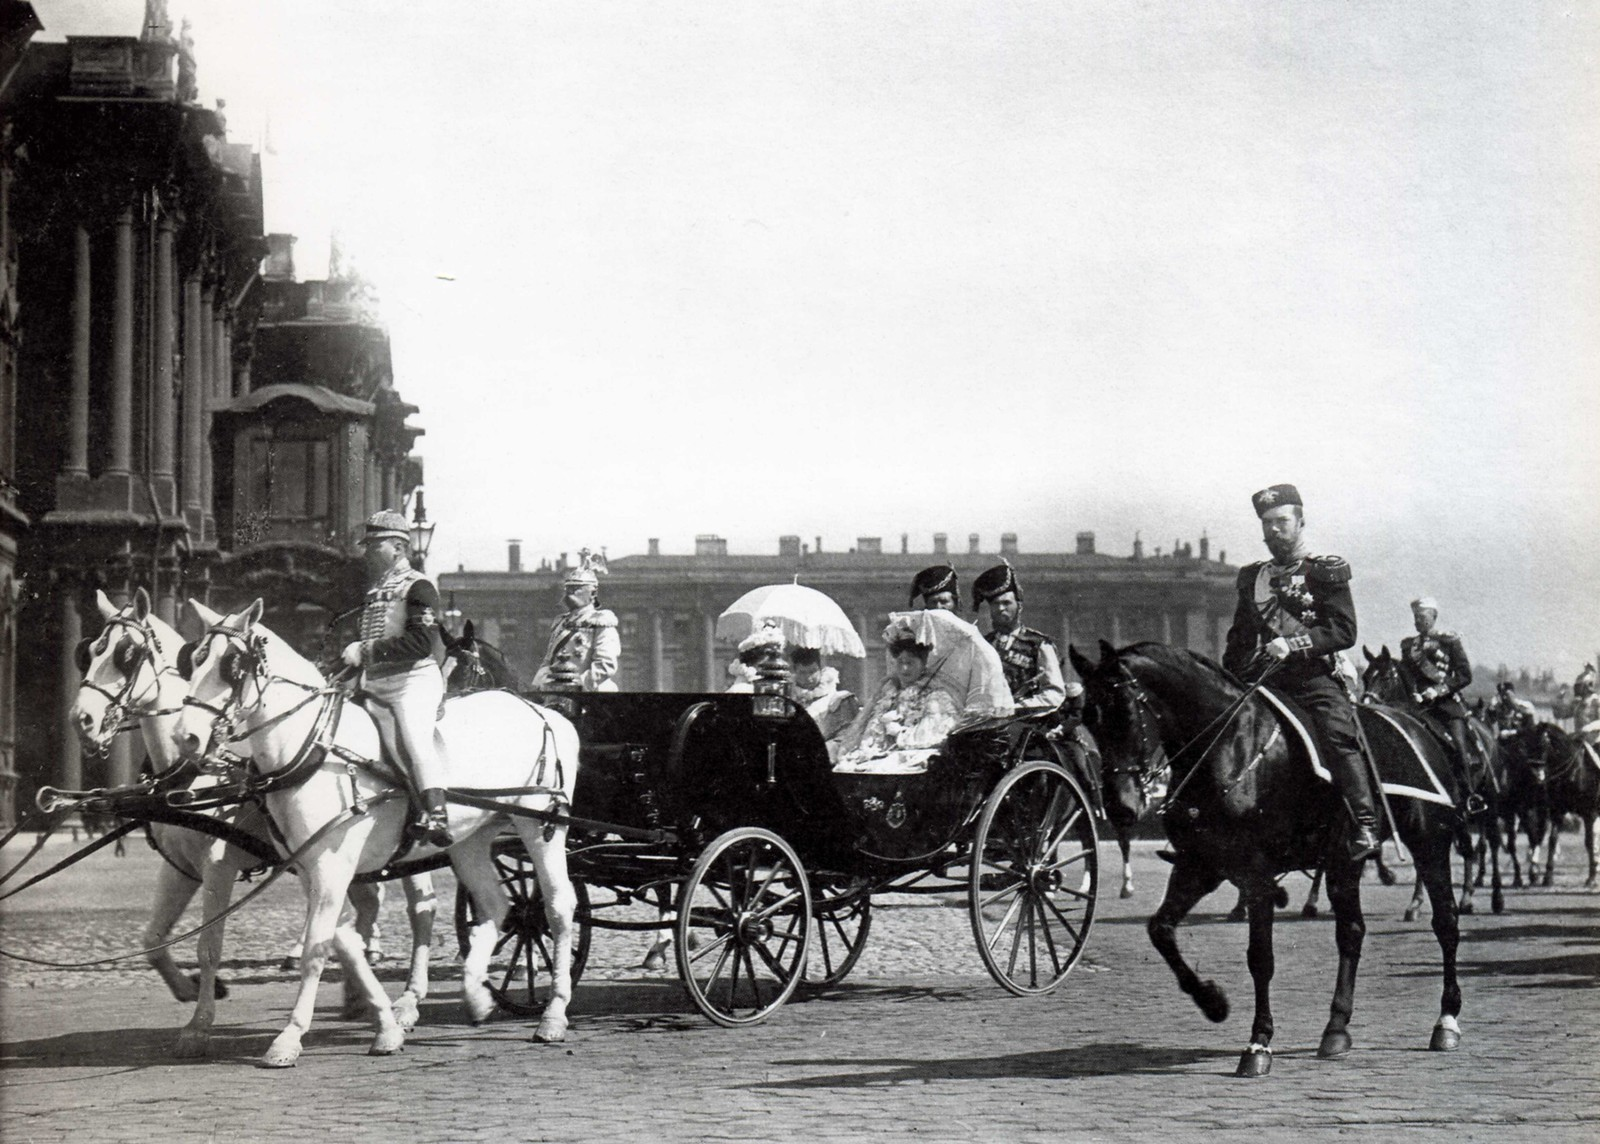 1901. Император Николай II, вдовствующая императрица Мария Федоровна и императрица Александра Федоровна. Майский парад (вариант).